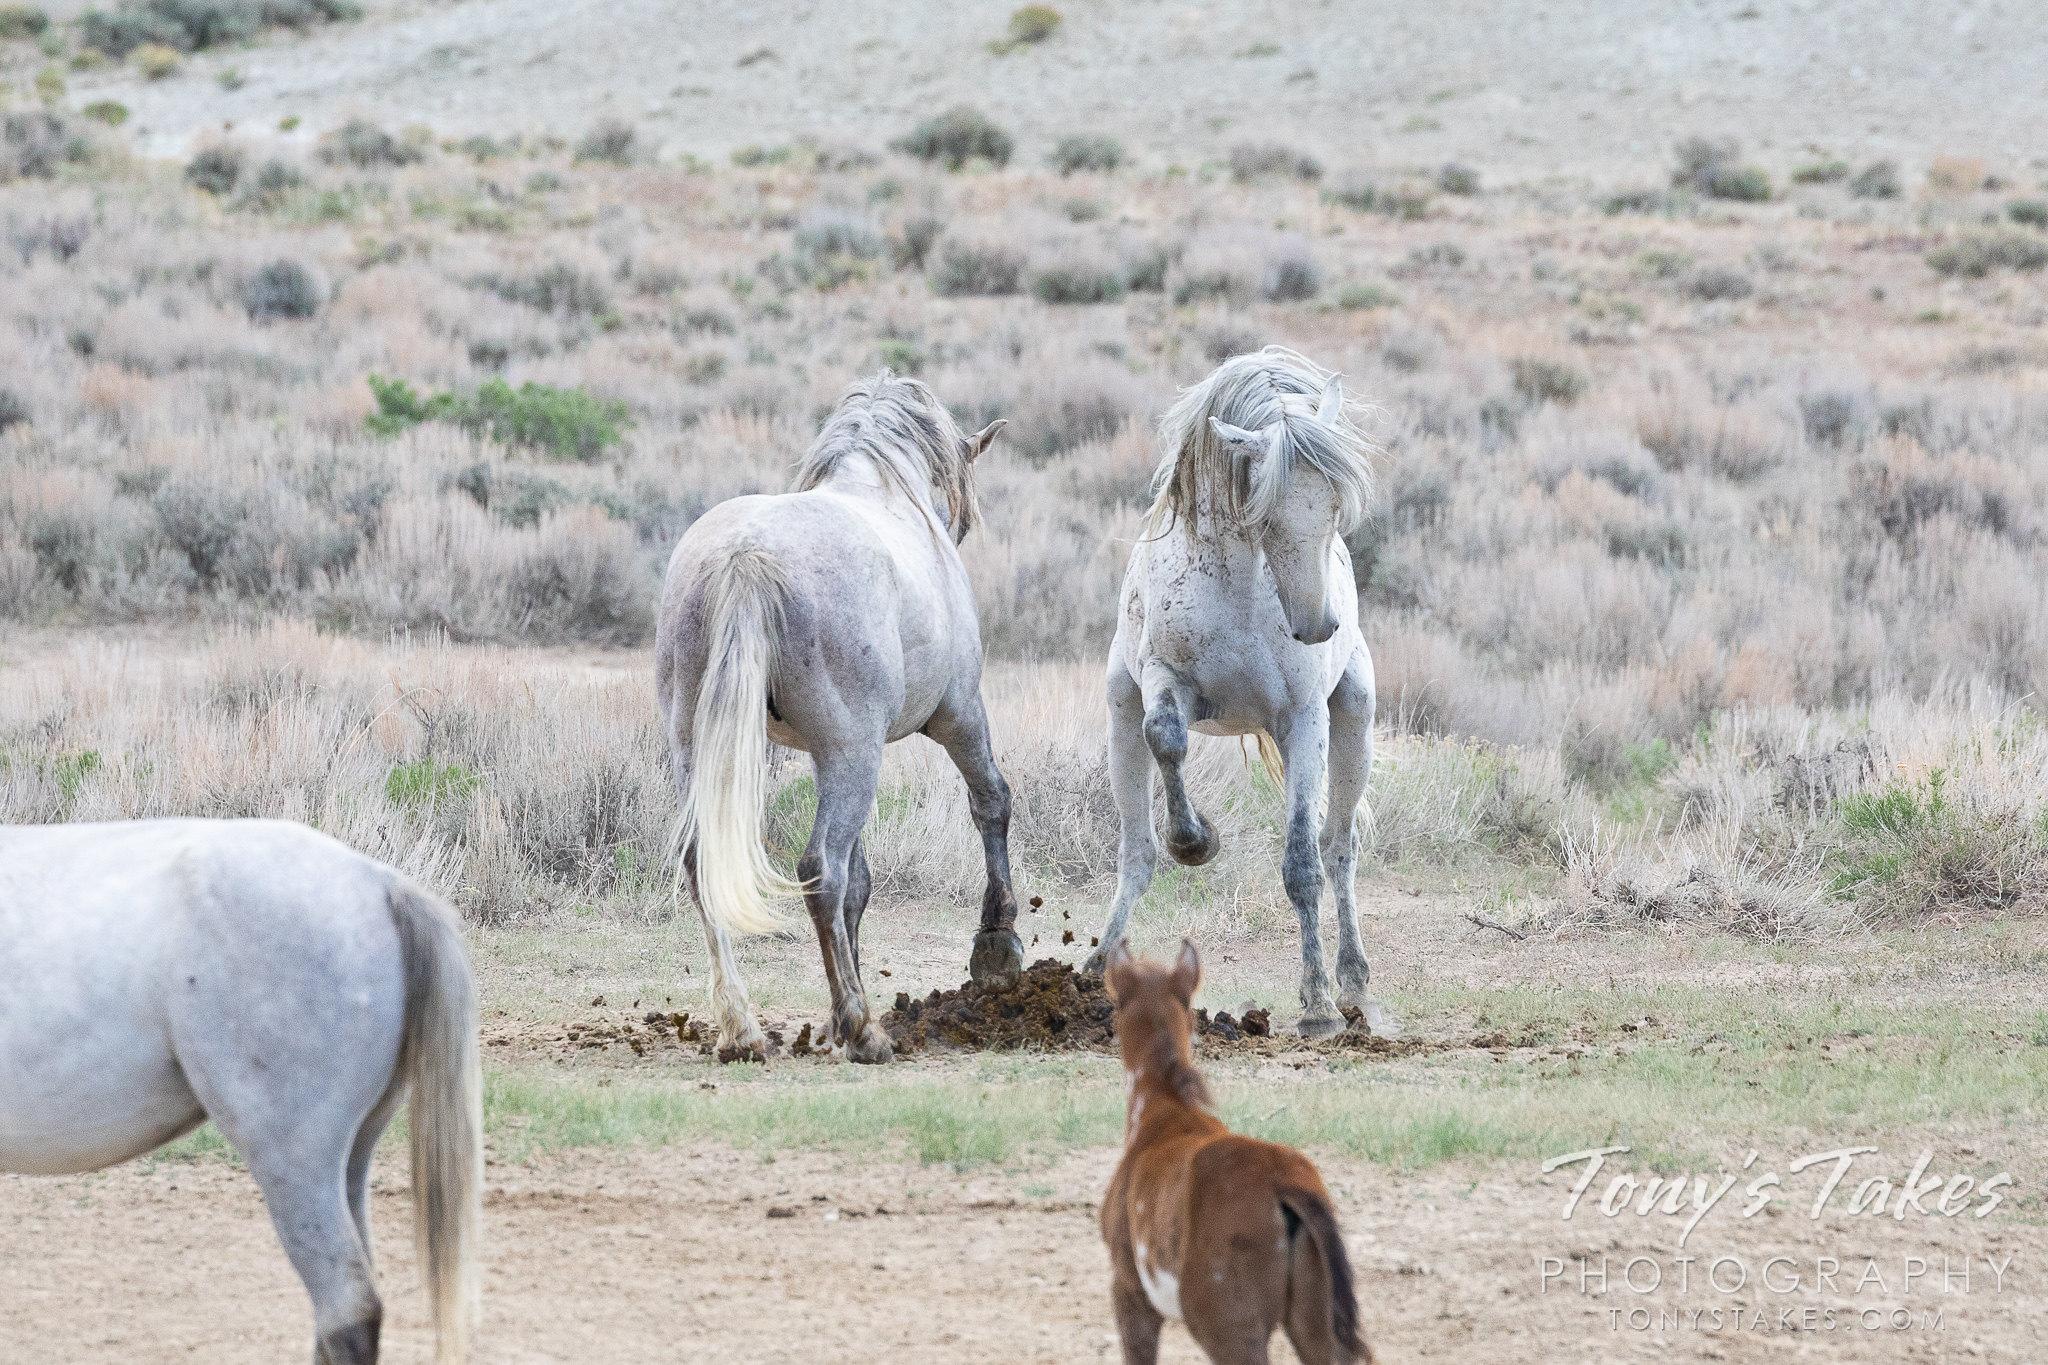 Stallion delivers devastating blow to opponent